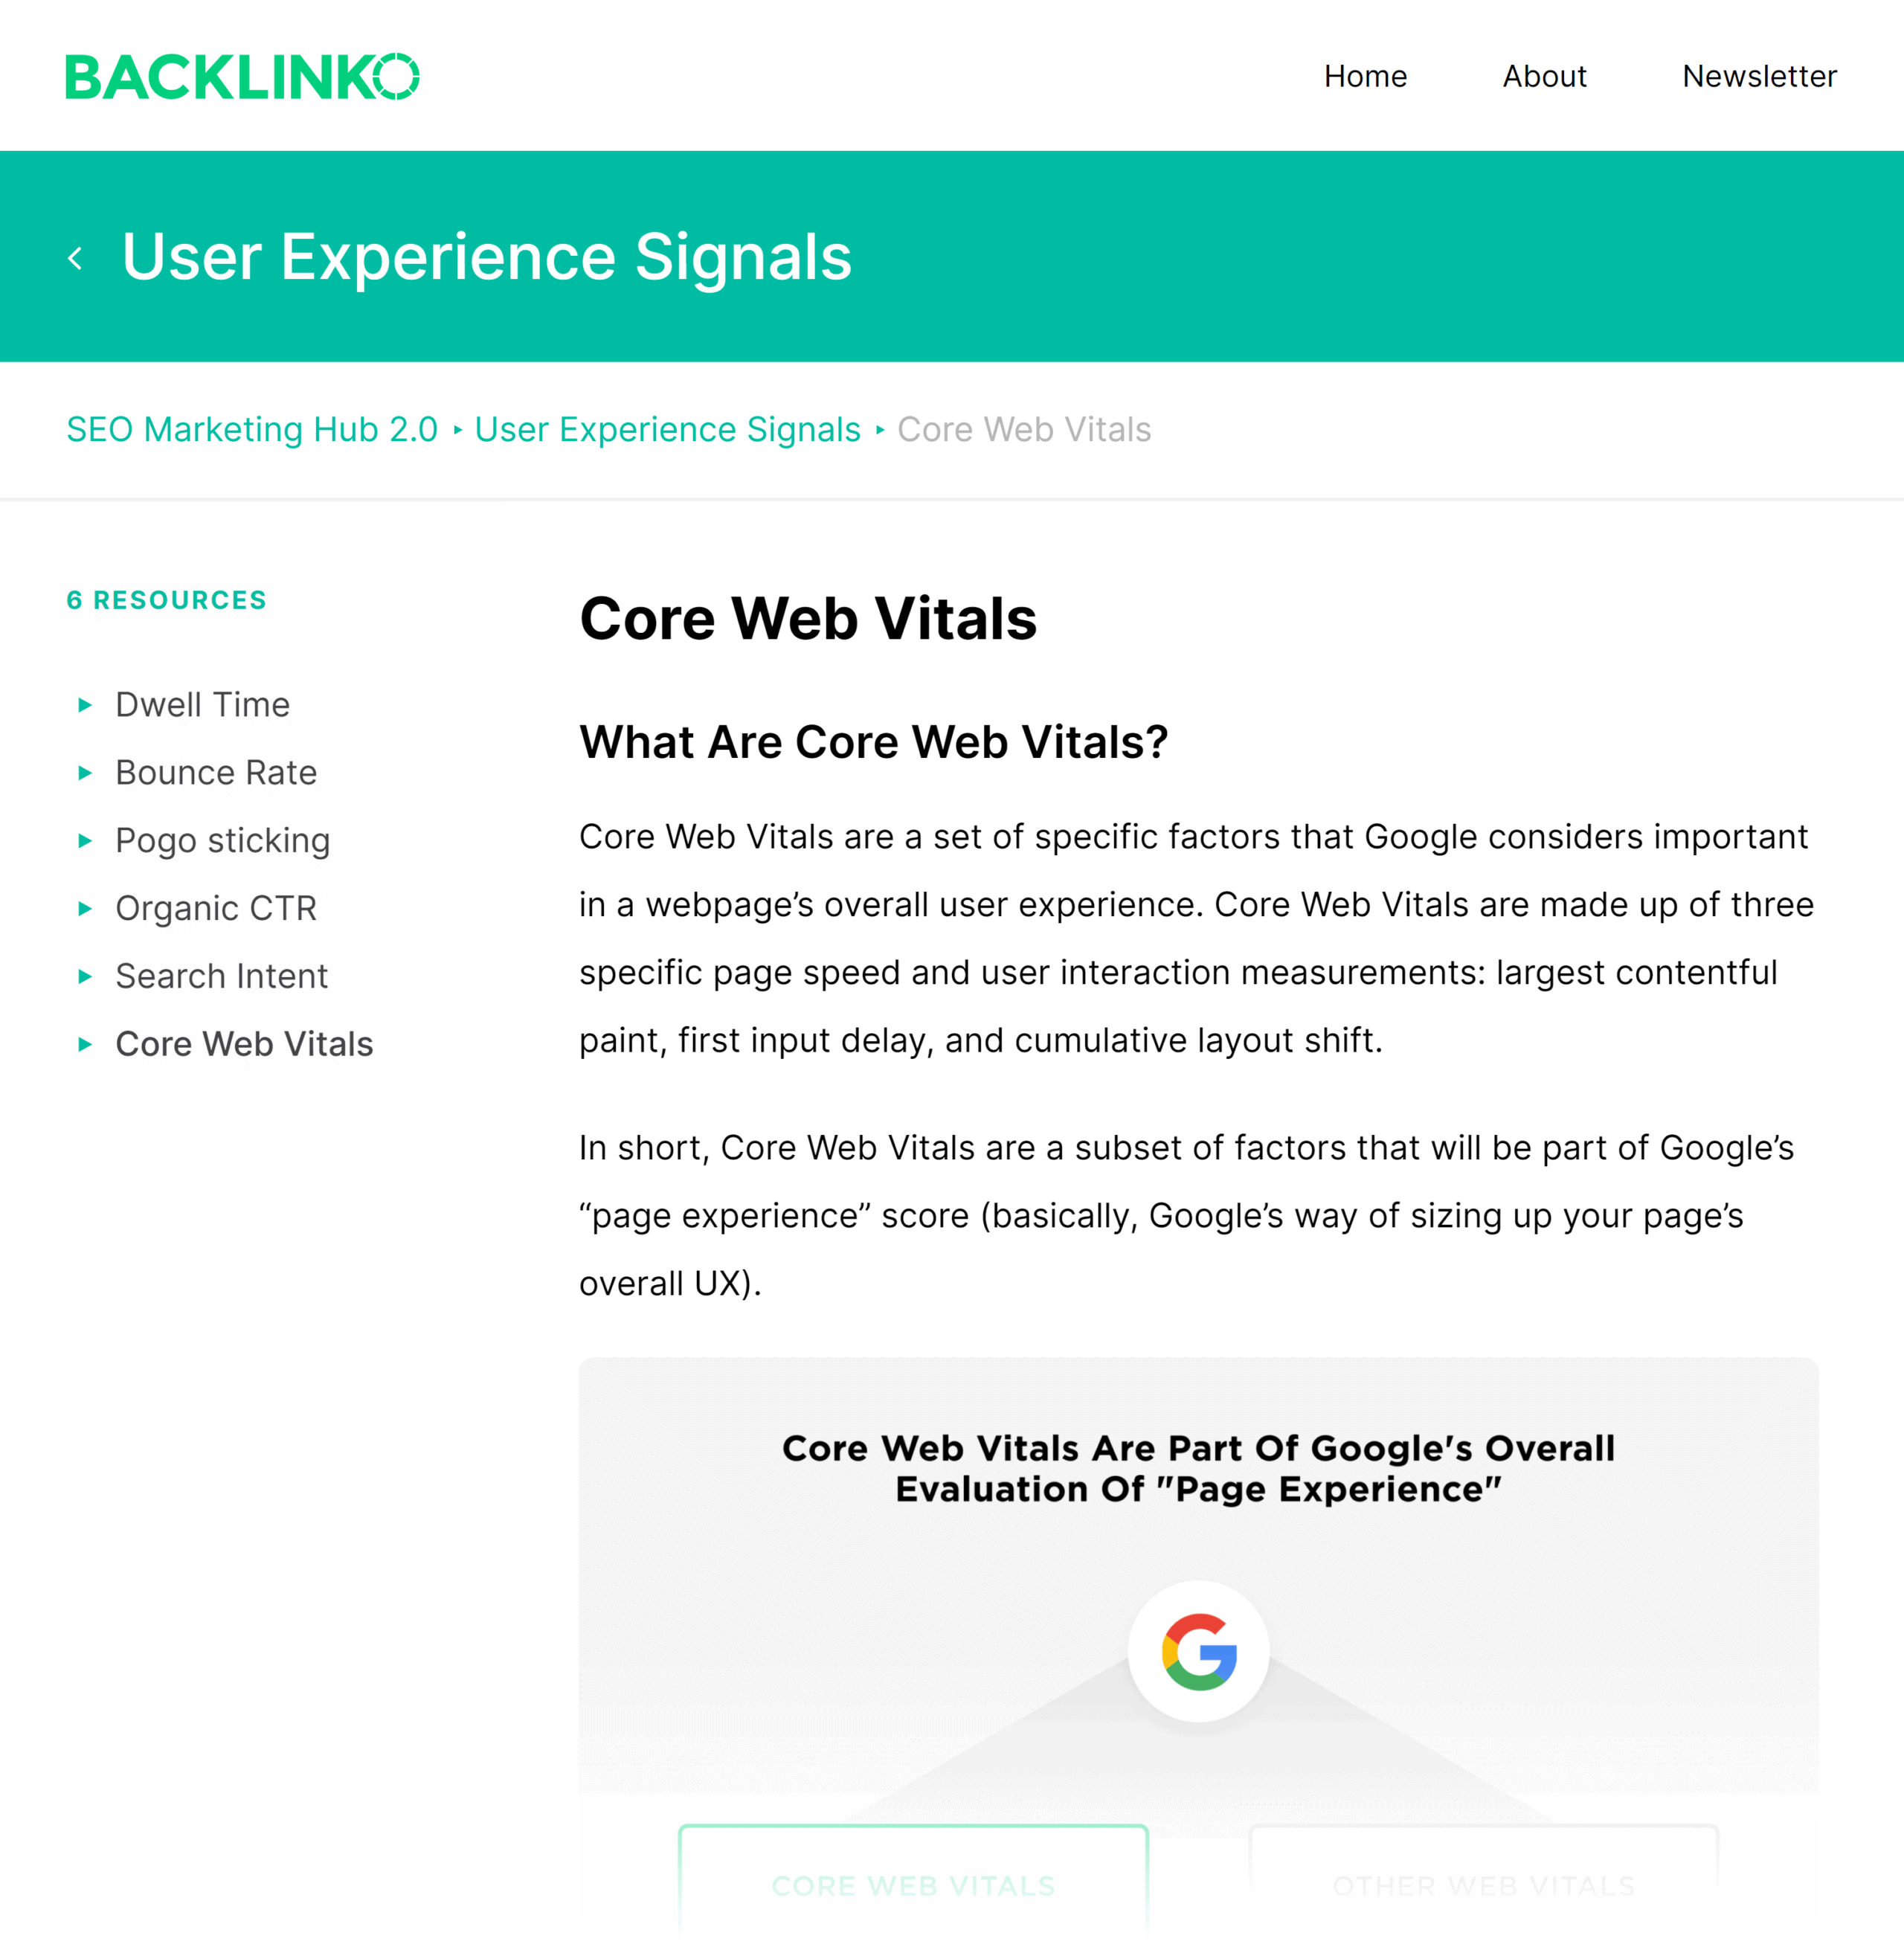 Backlinko SEO Hub – Core web vitals